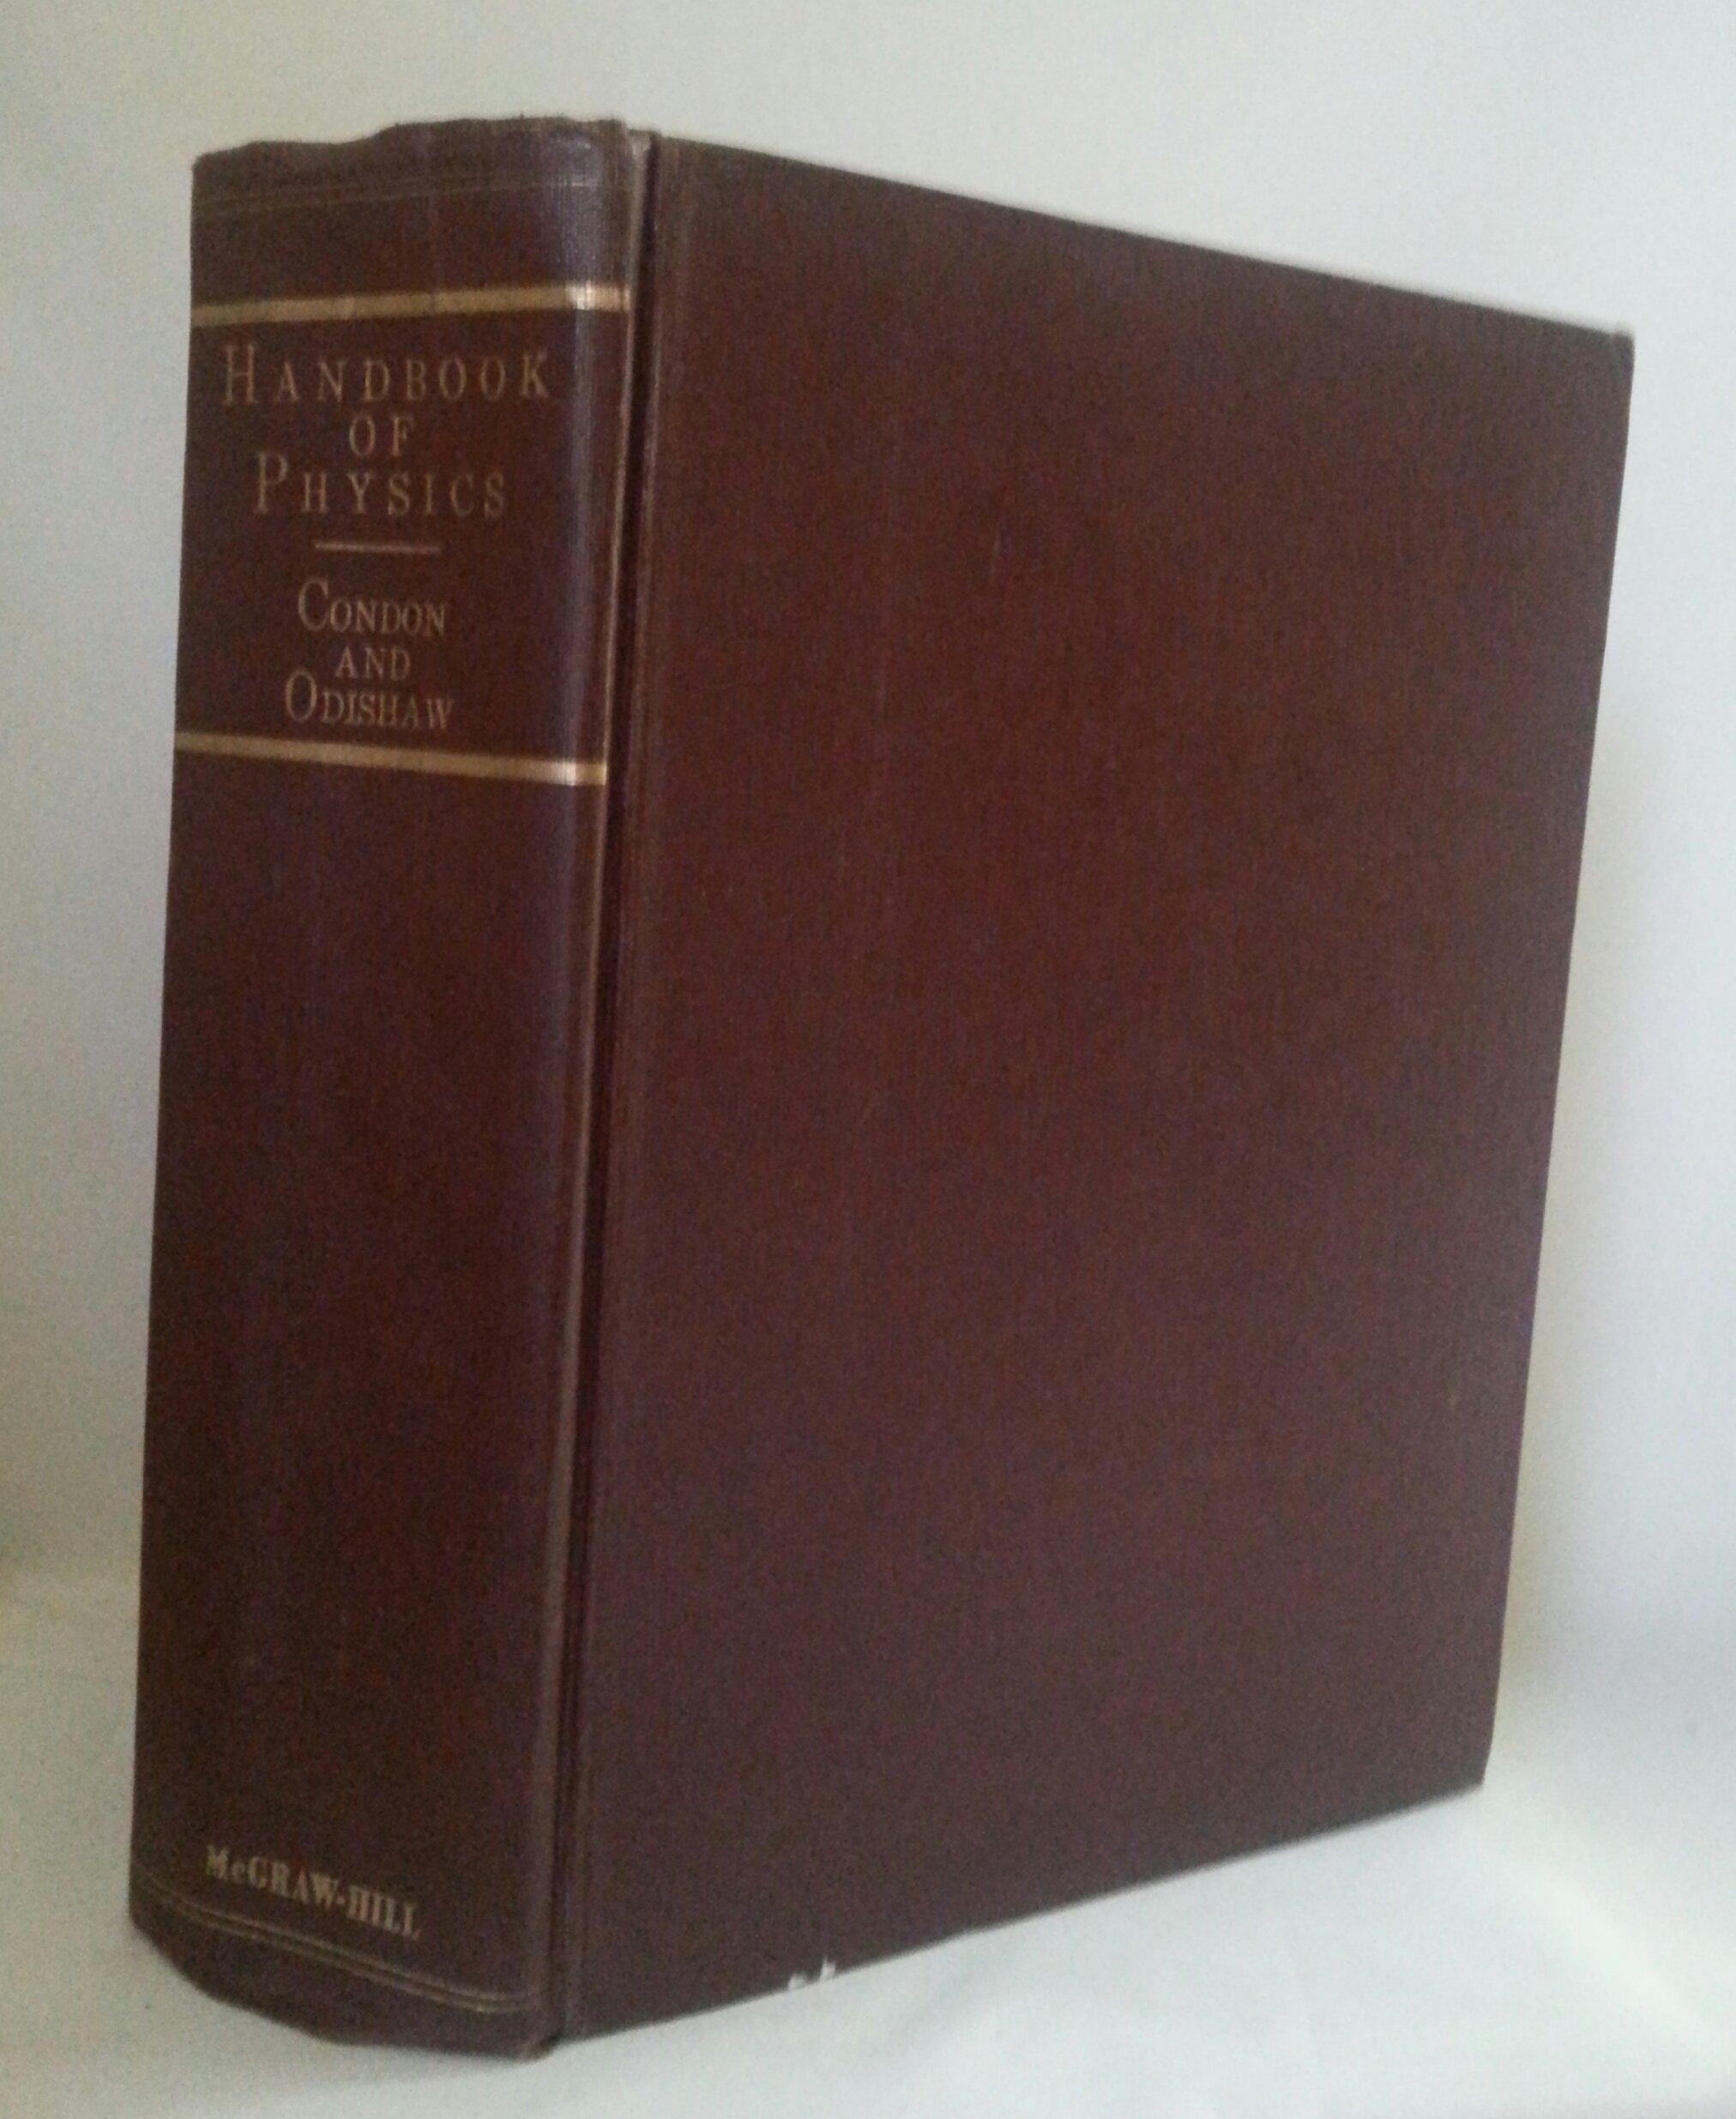 Handbook of Physics, E. U. Condon Editor